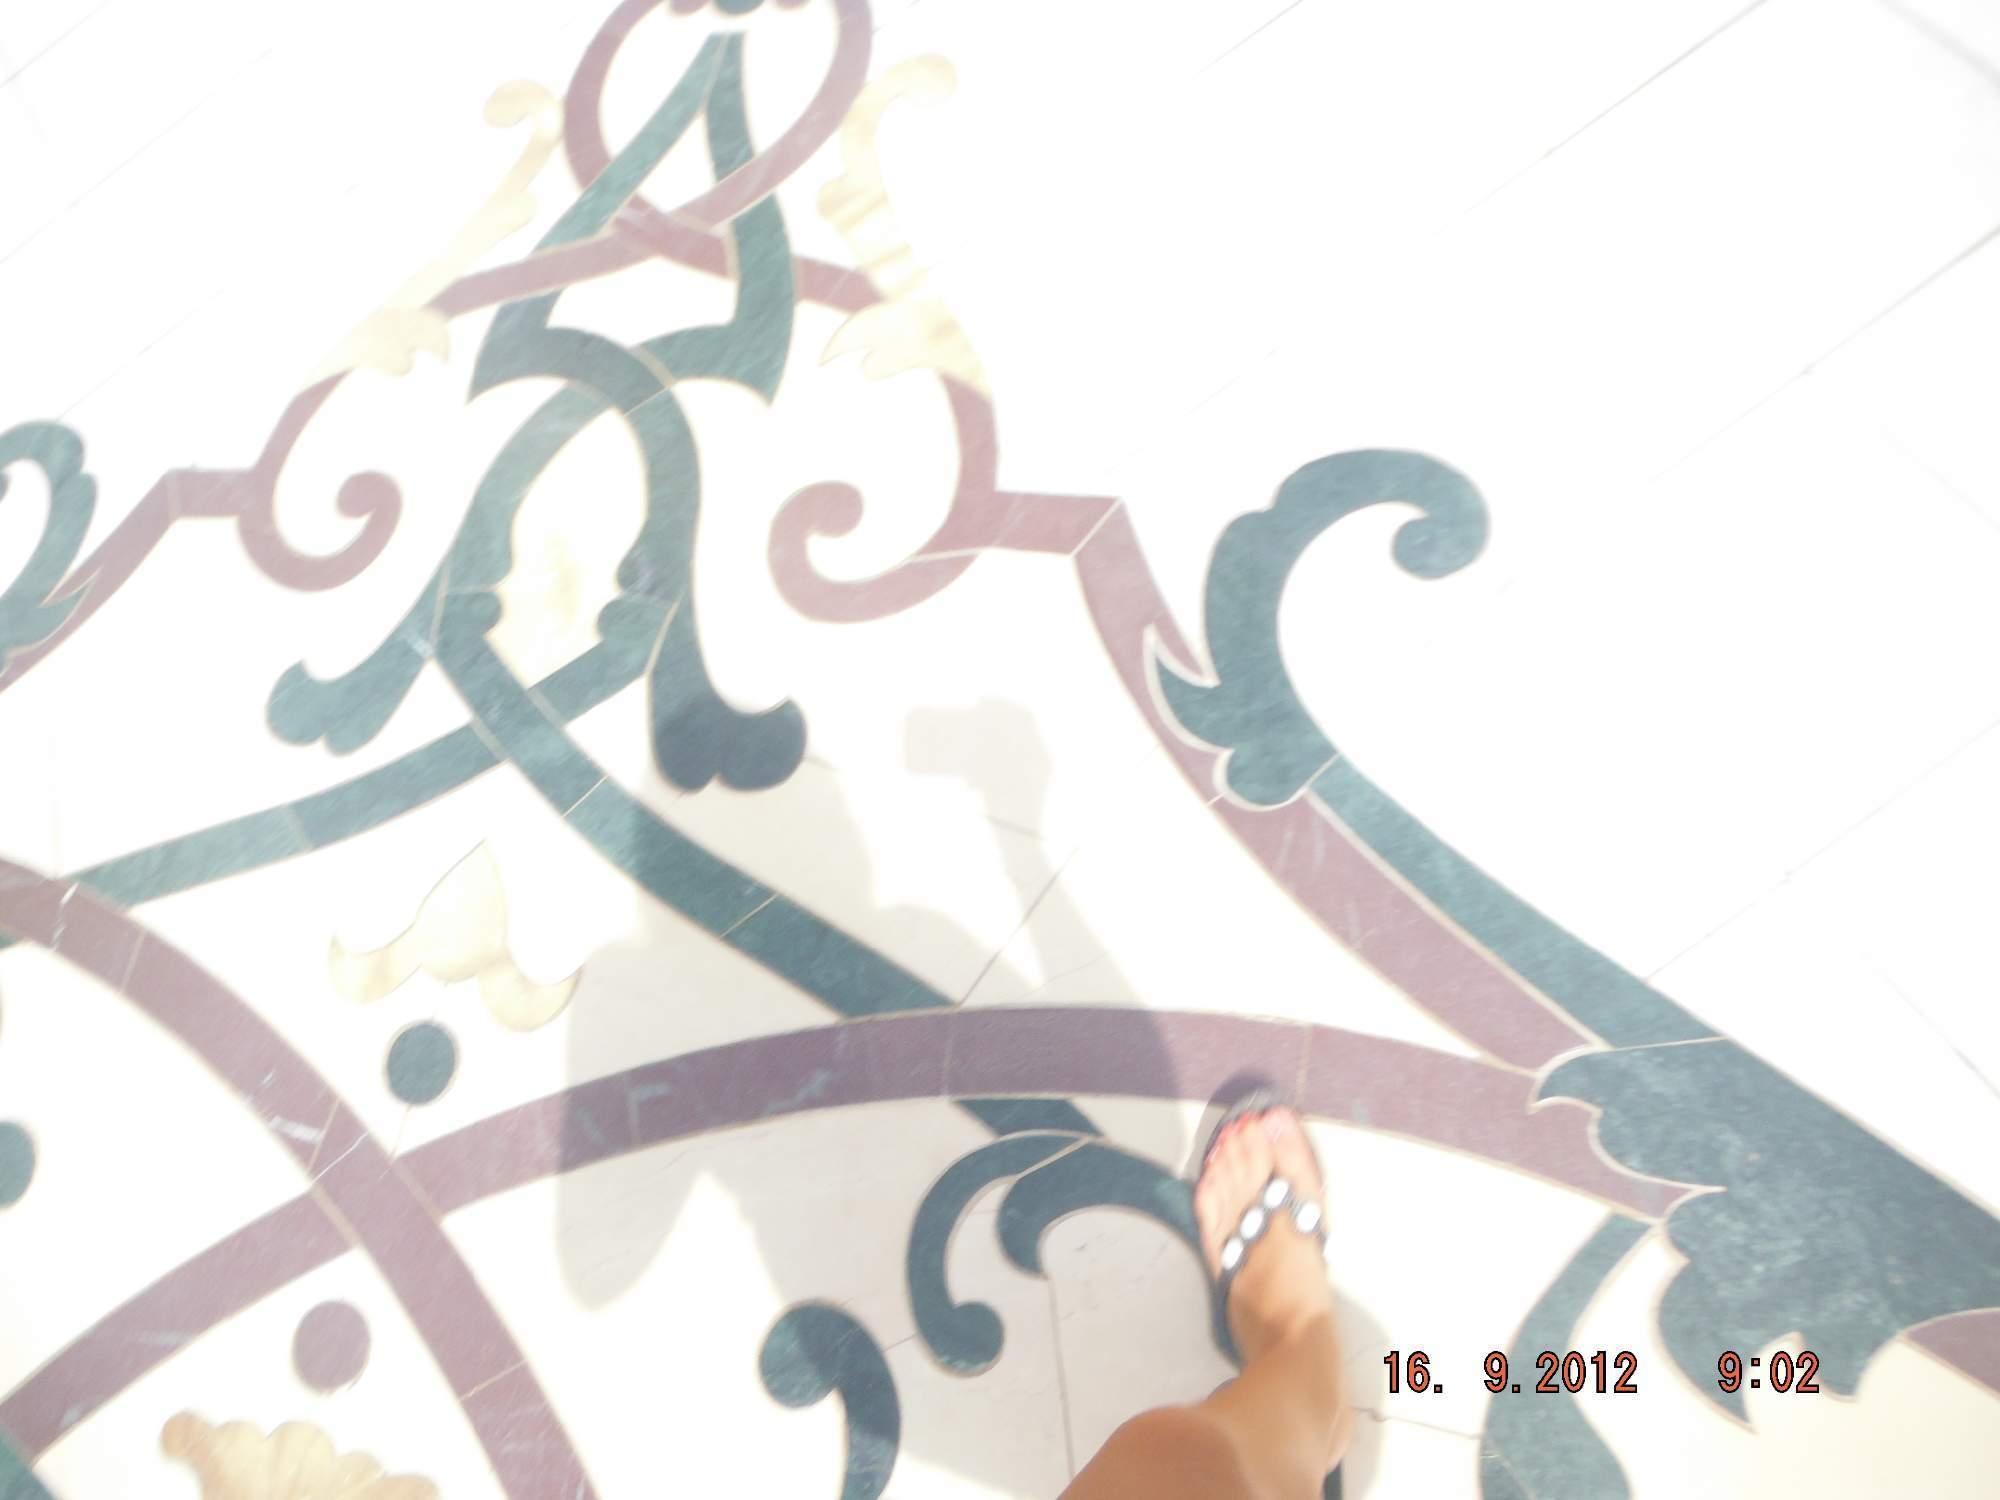 http://img24.rajce.idnes.cz/d2403/13/13214/13214242_a1e43f49e51a1daa7632f800d4edae3f/images/SAE362.jpg